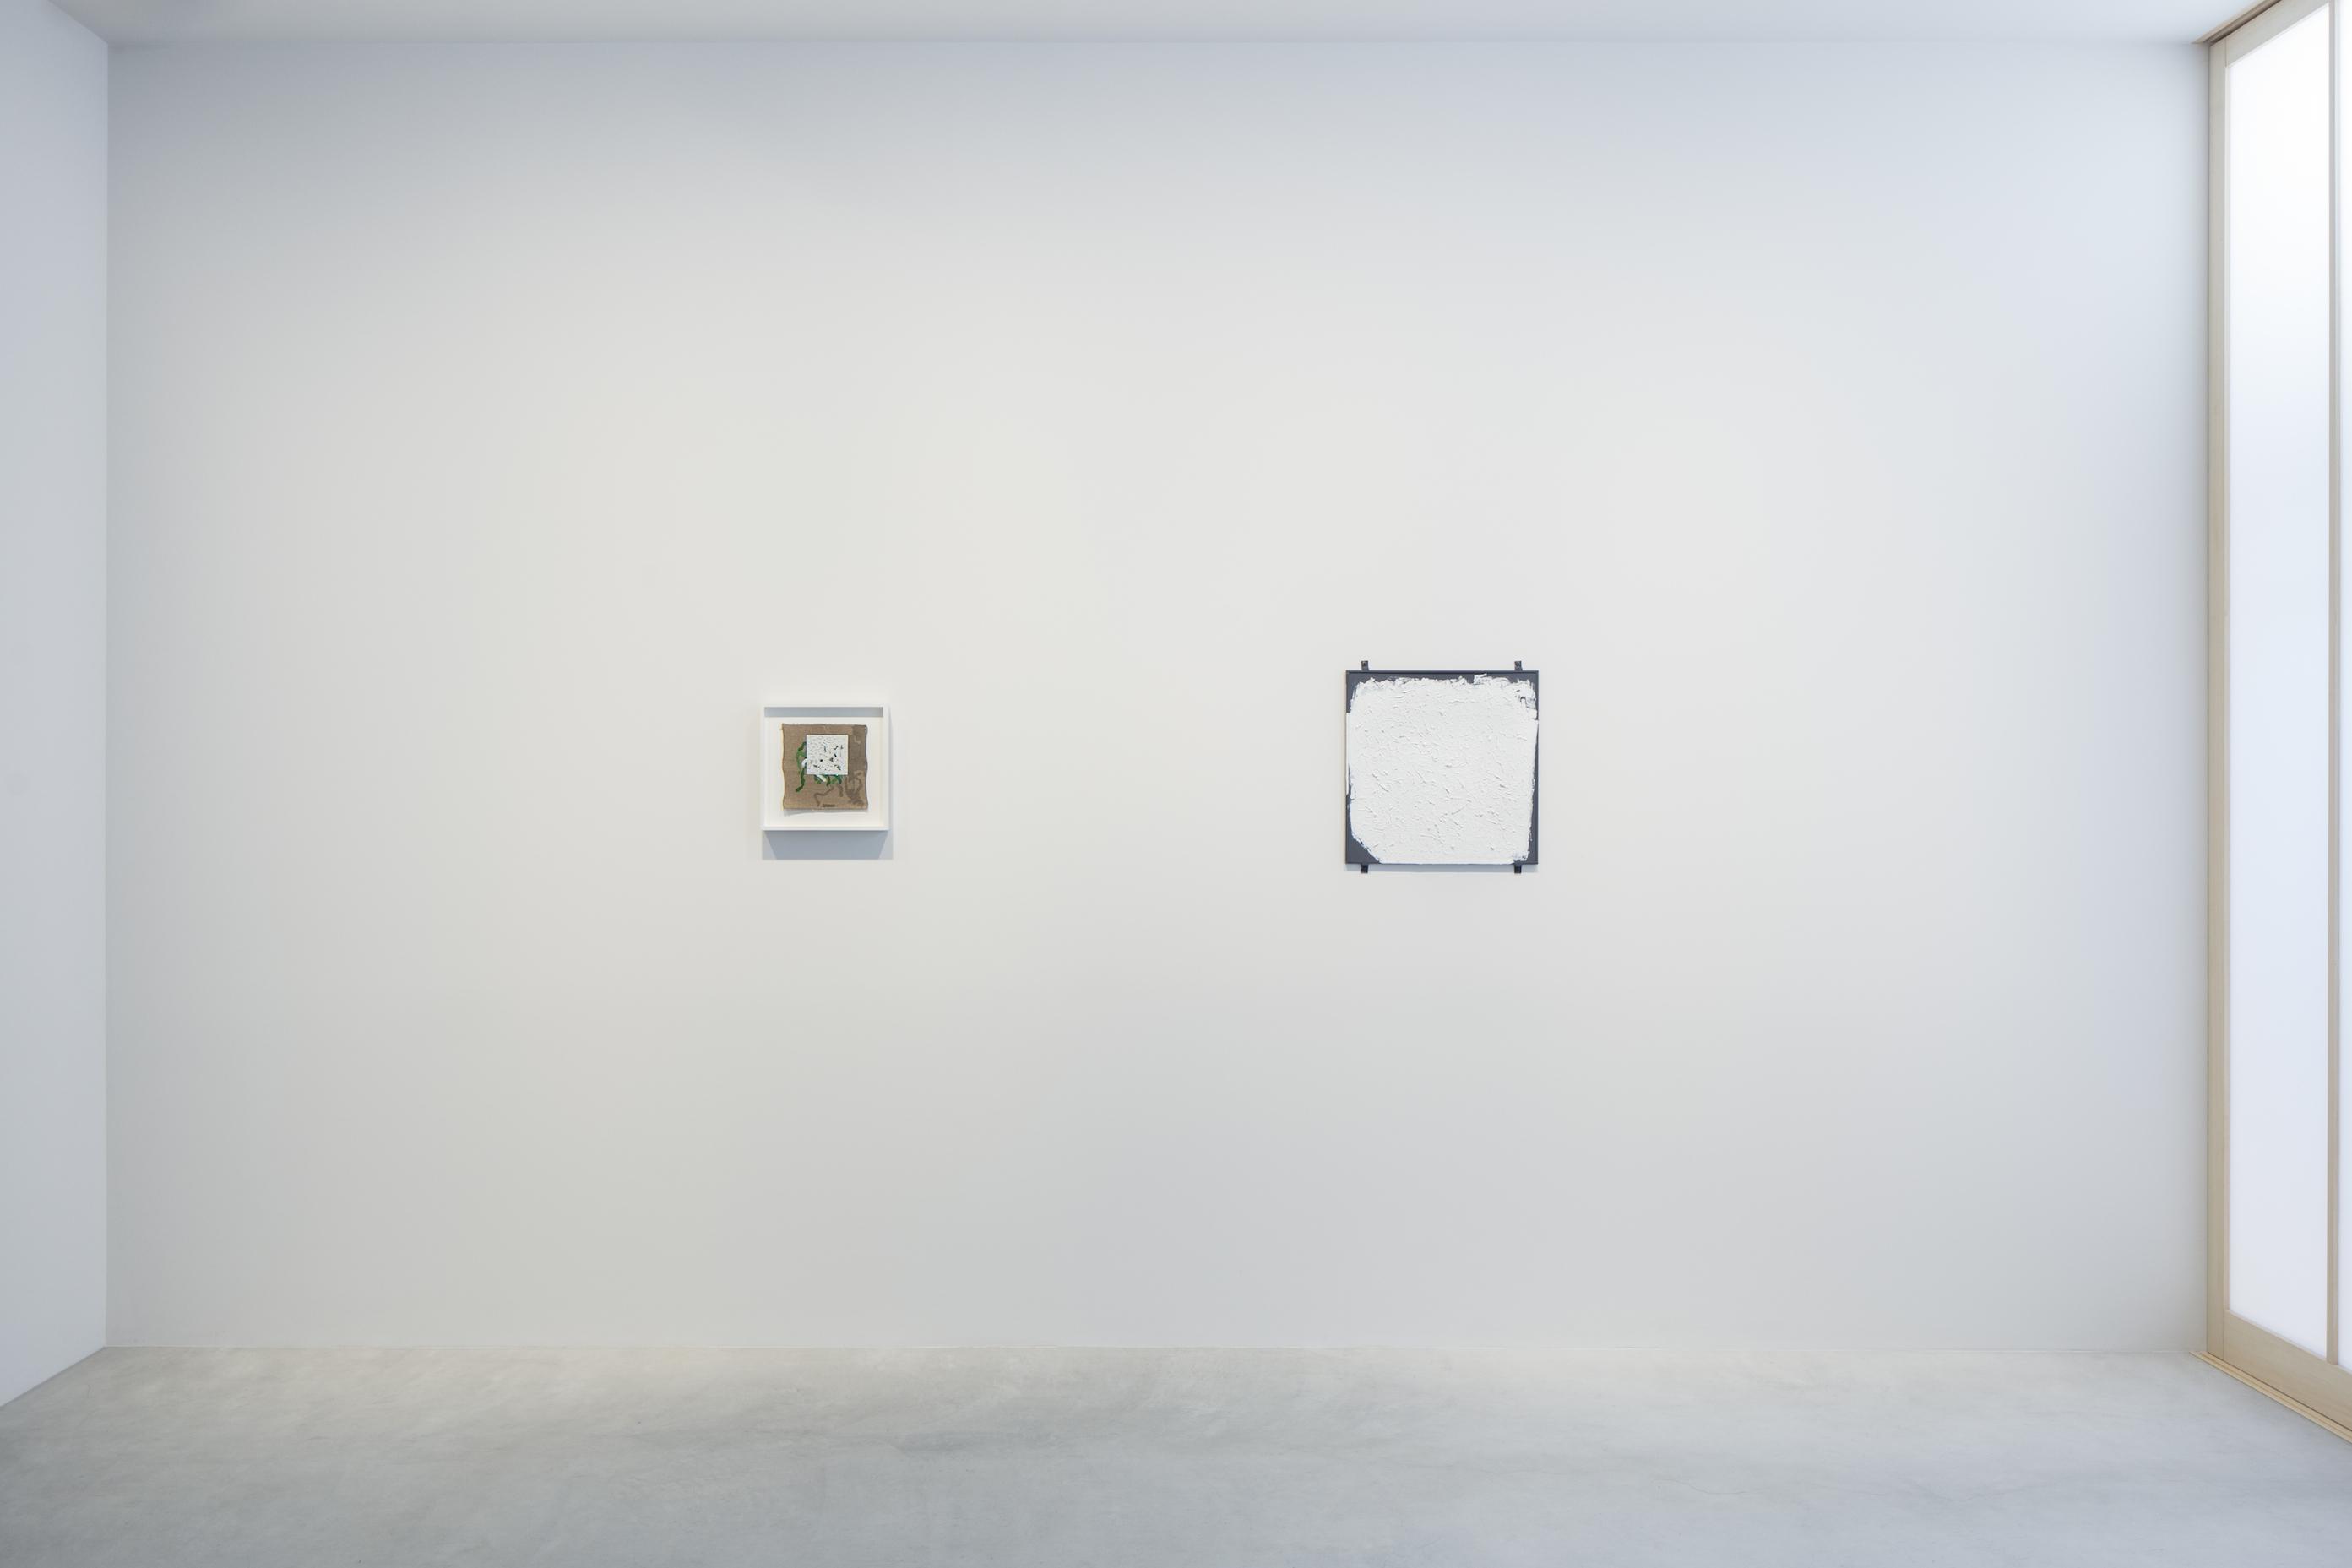 Photograph 1 from Robert Ryman exhibition.